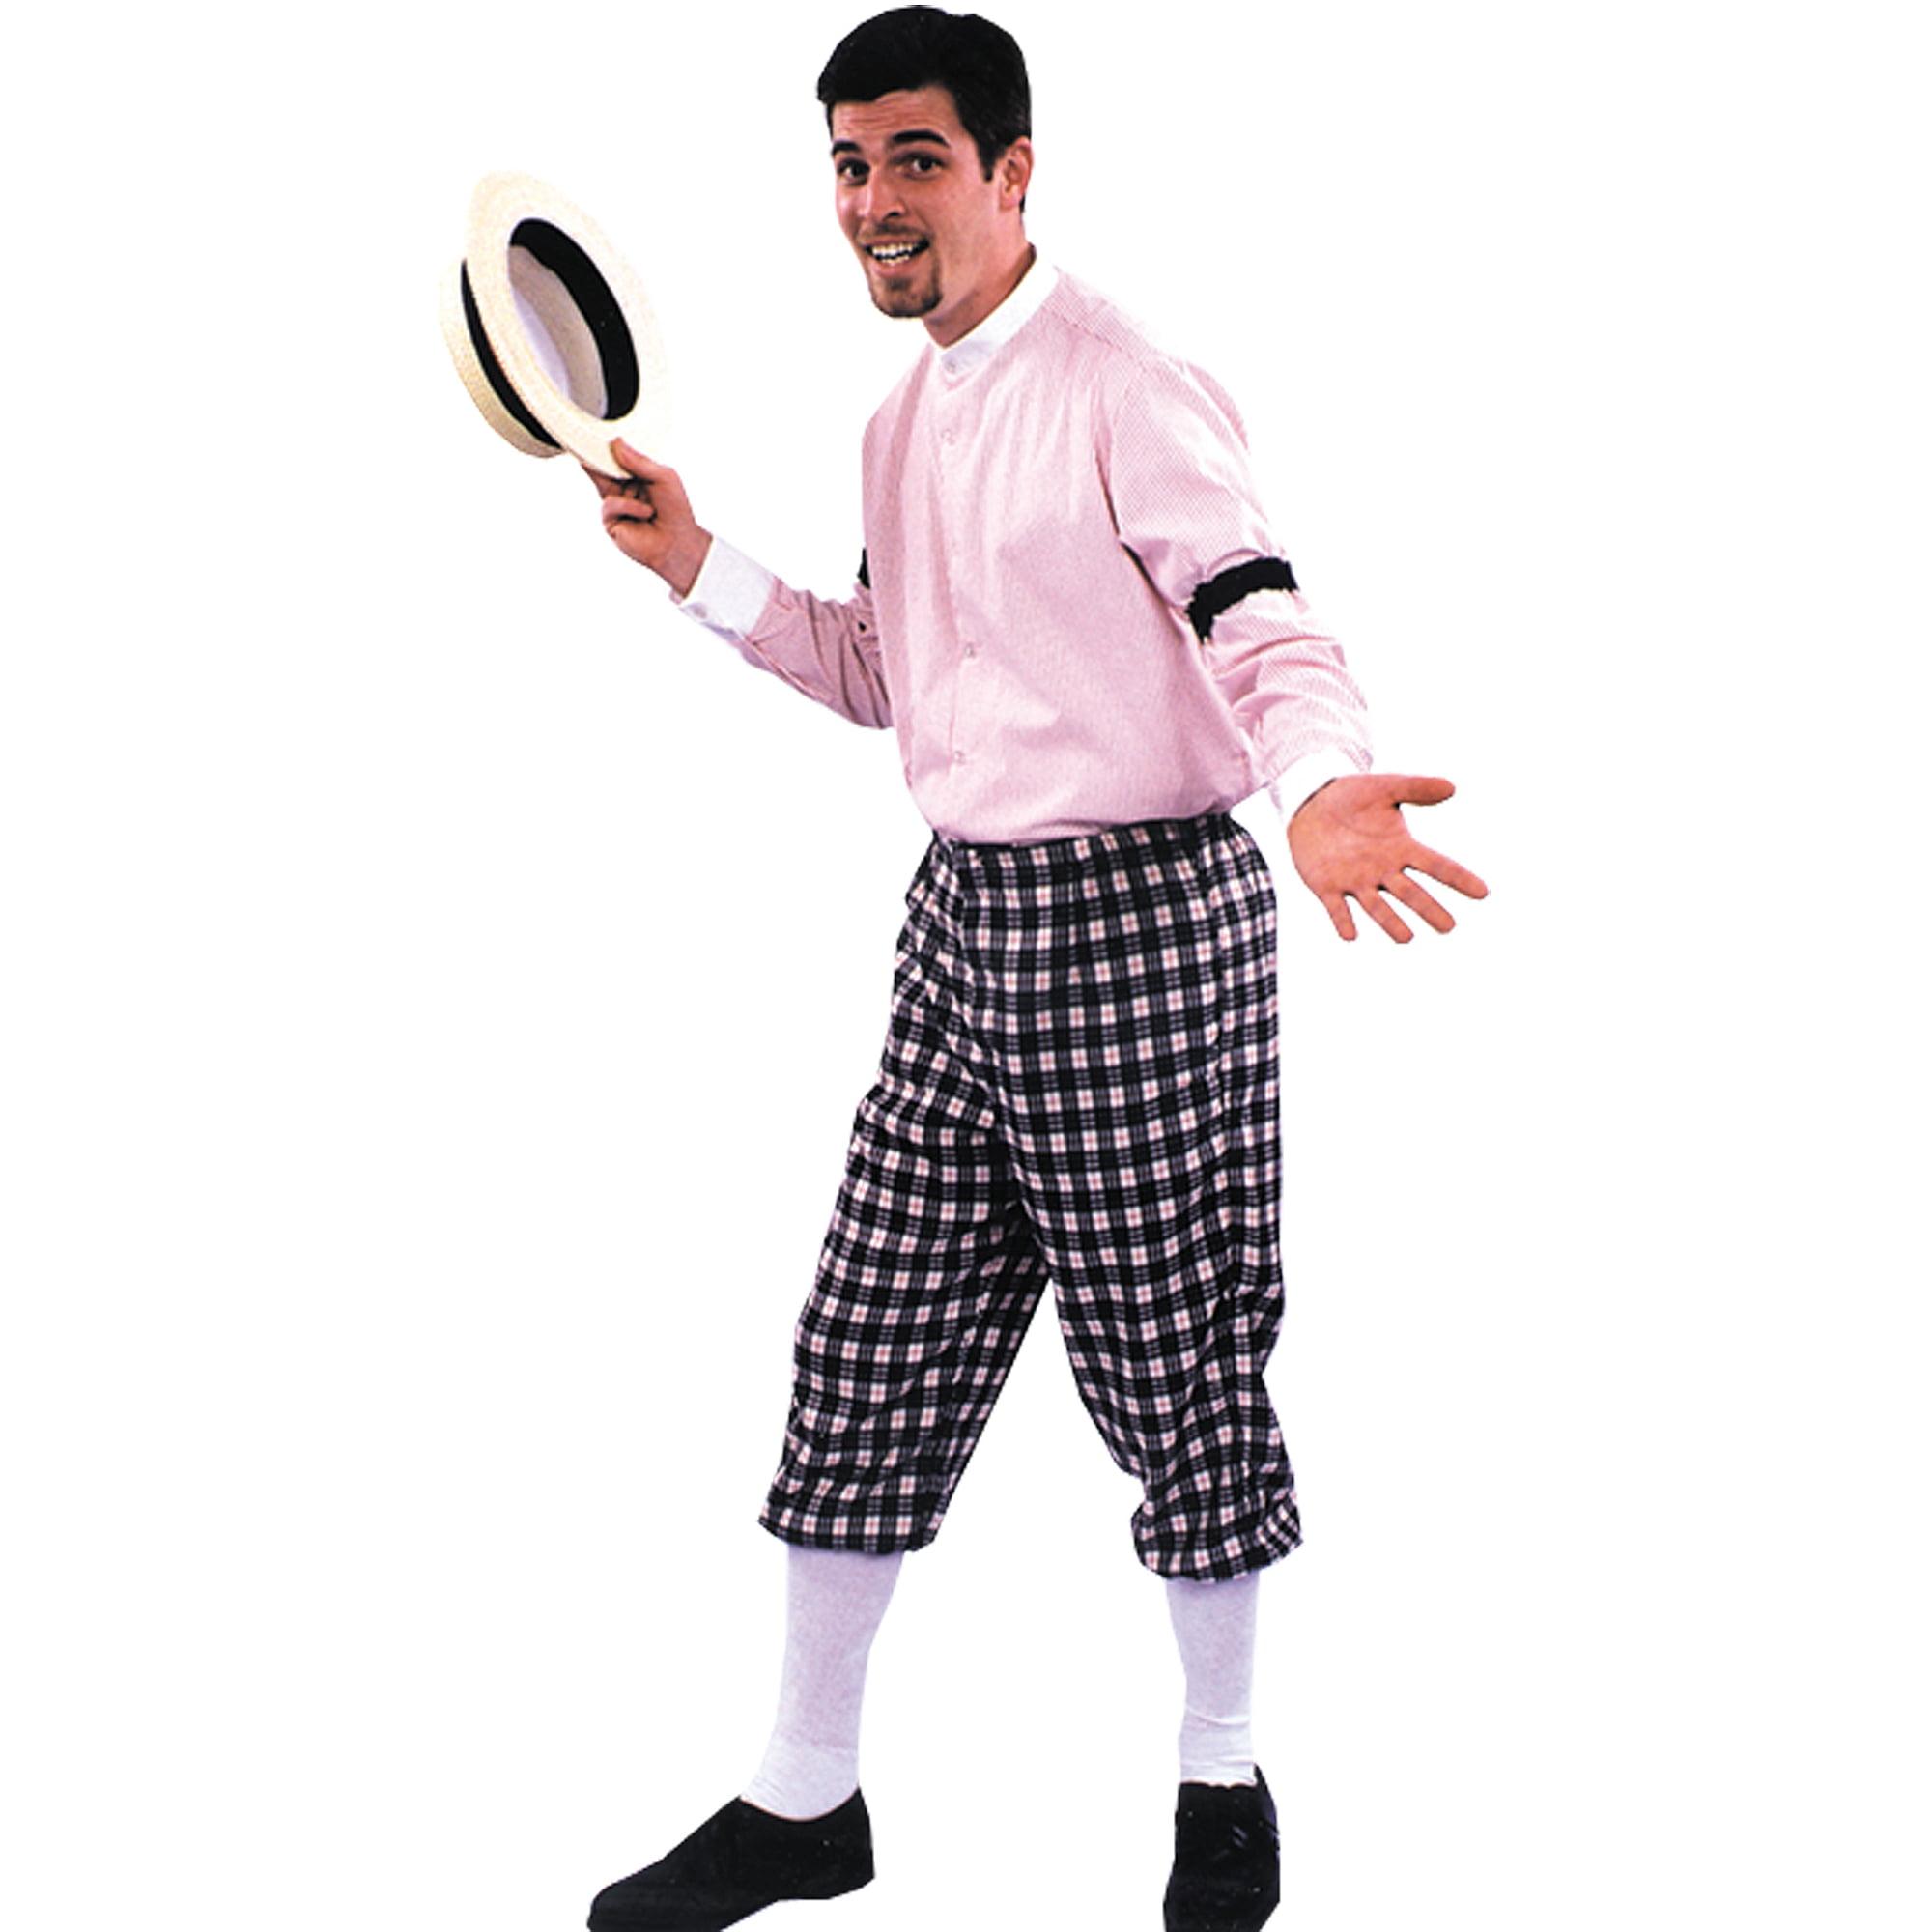 Knickers Adult Halloween Costume